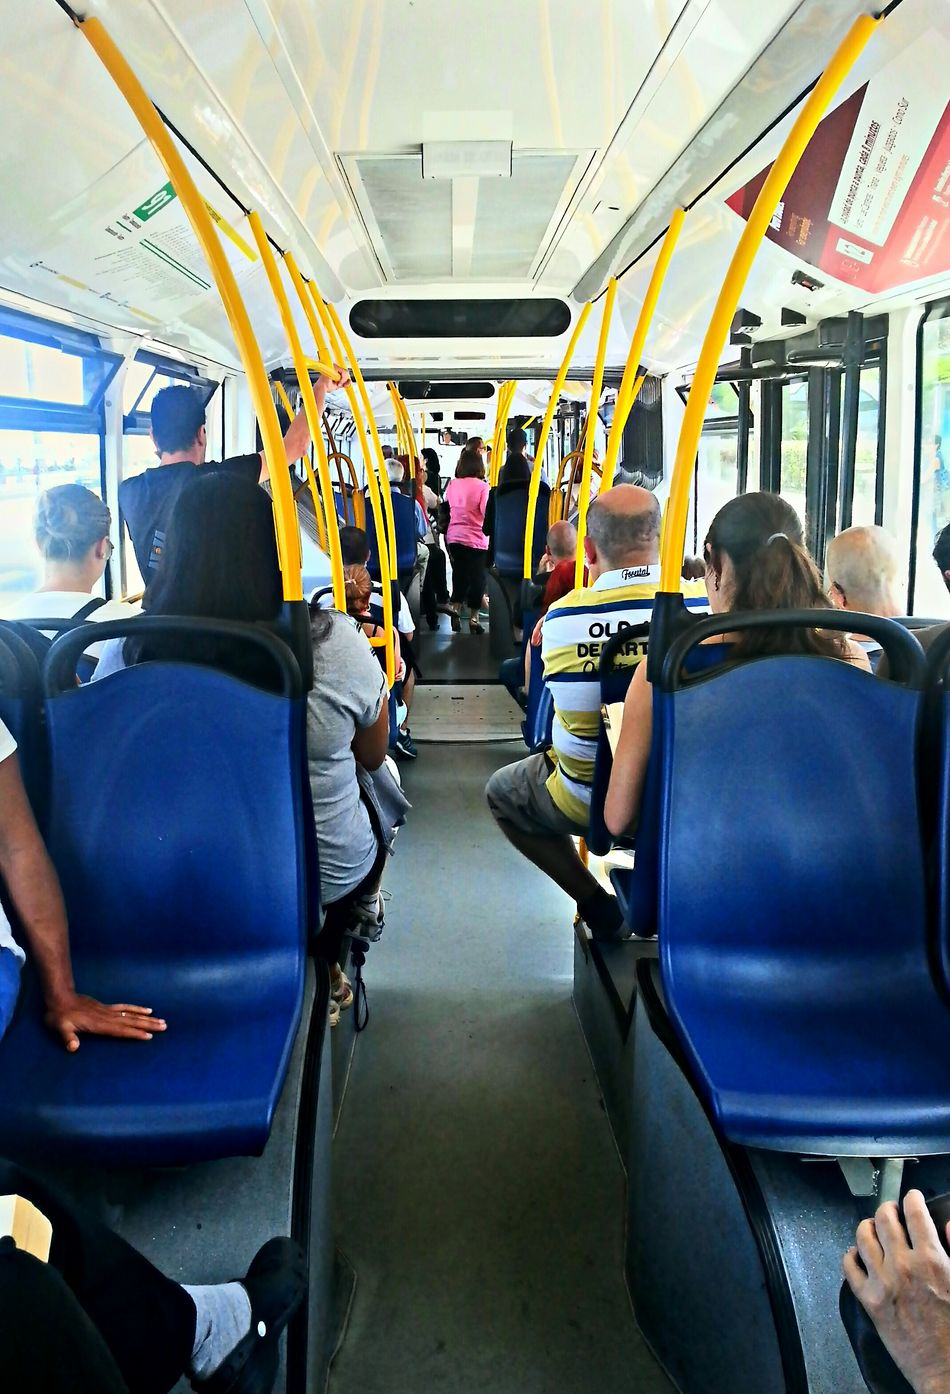 Happy weekend Eyeemerss!!! Feliz fin de semana Eyeemer@ss!!! We Are Photography, We Are EyeEm ...Unknow PeoplE... Working Public Transport